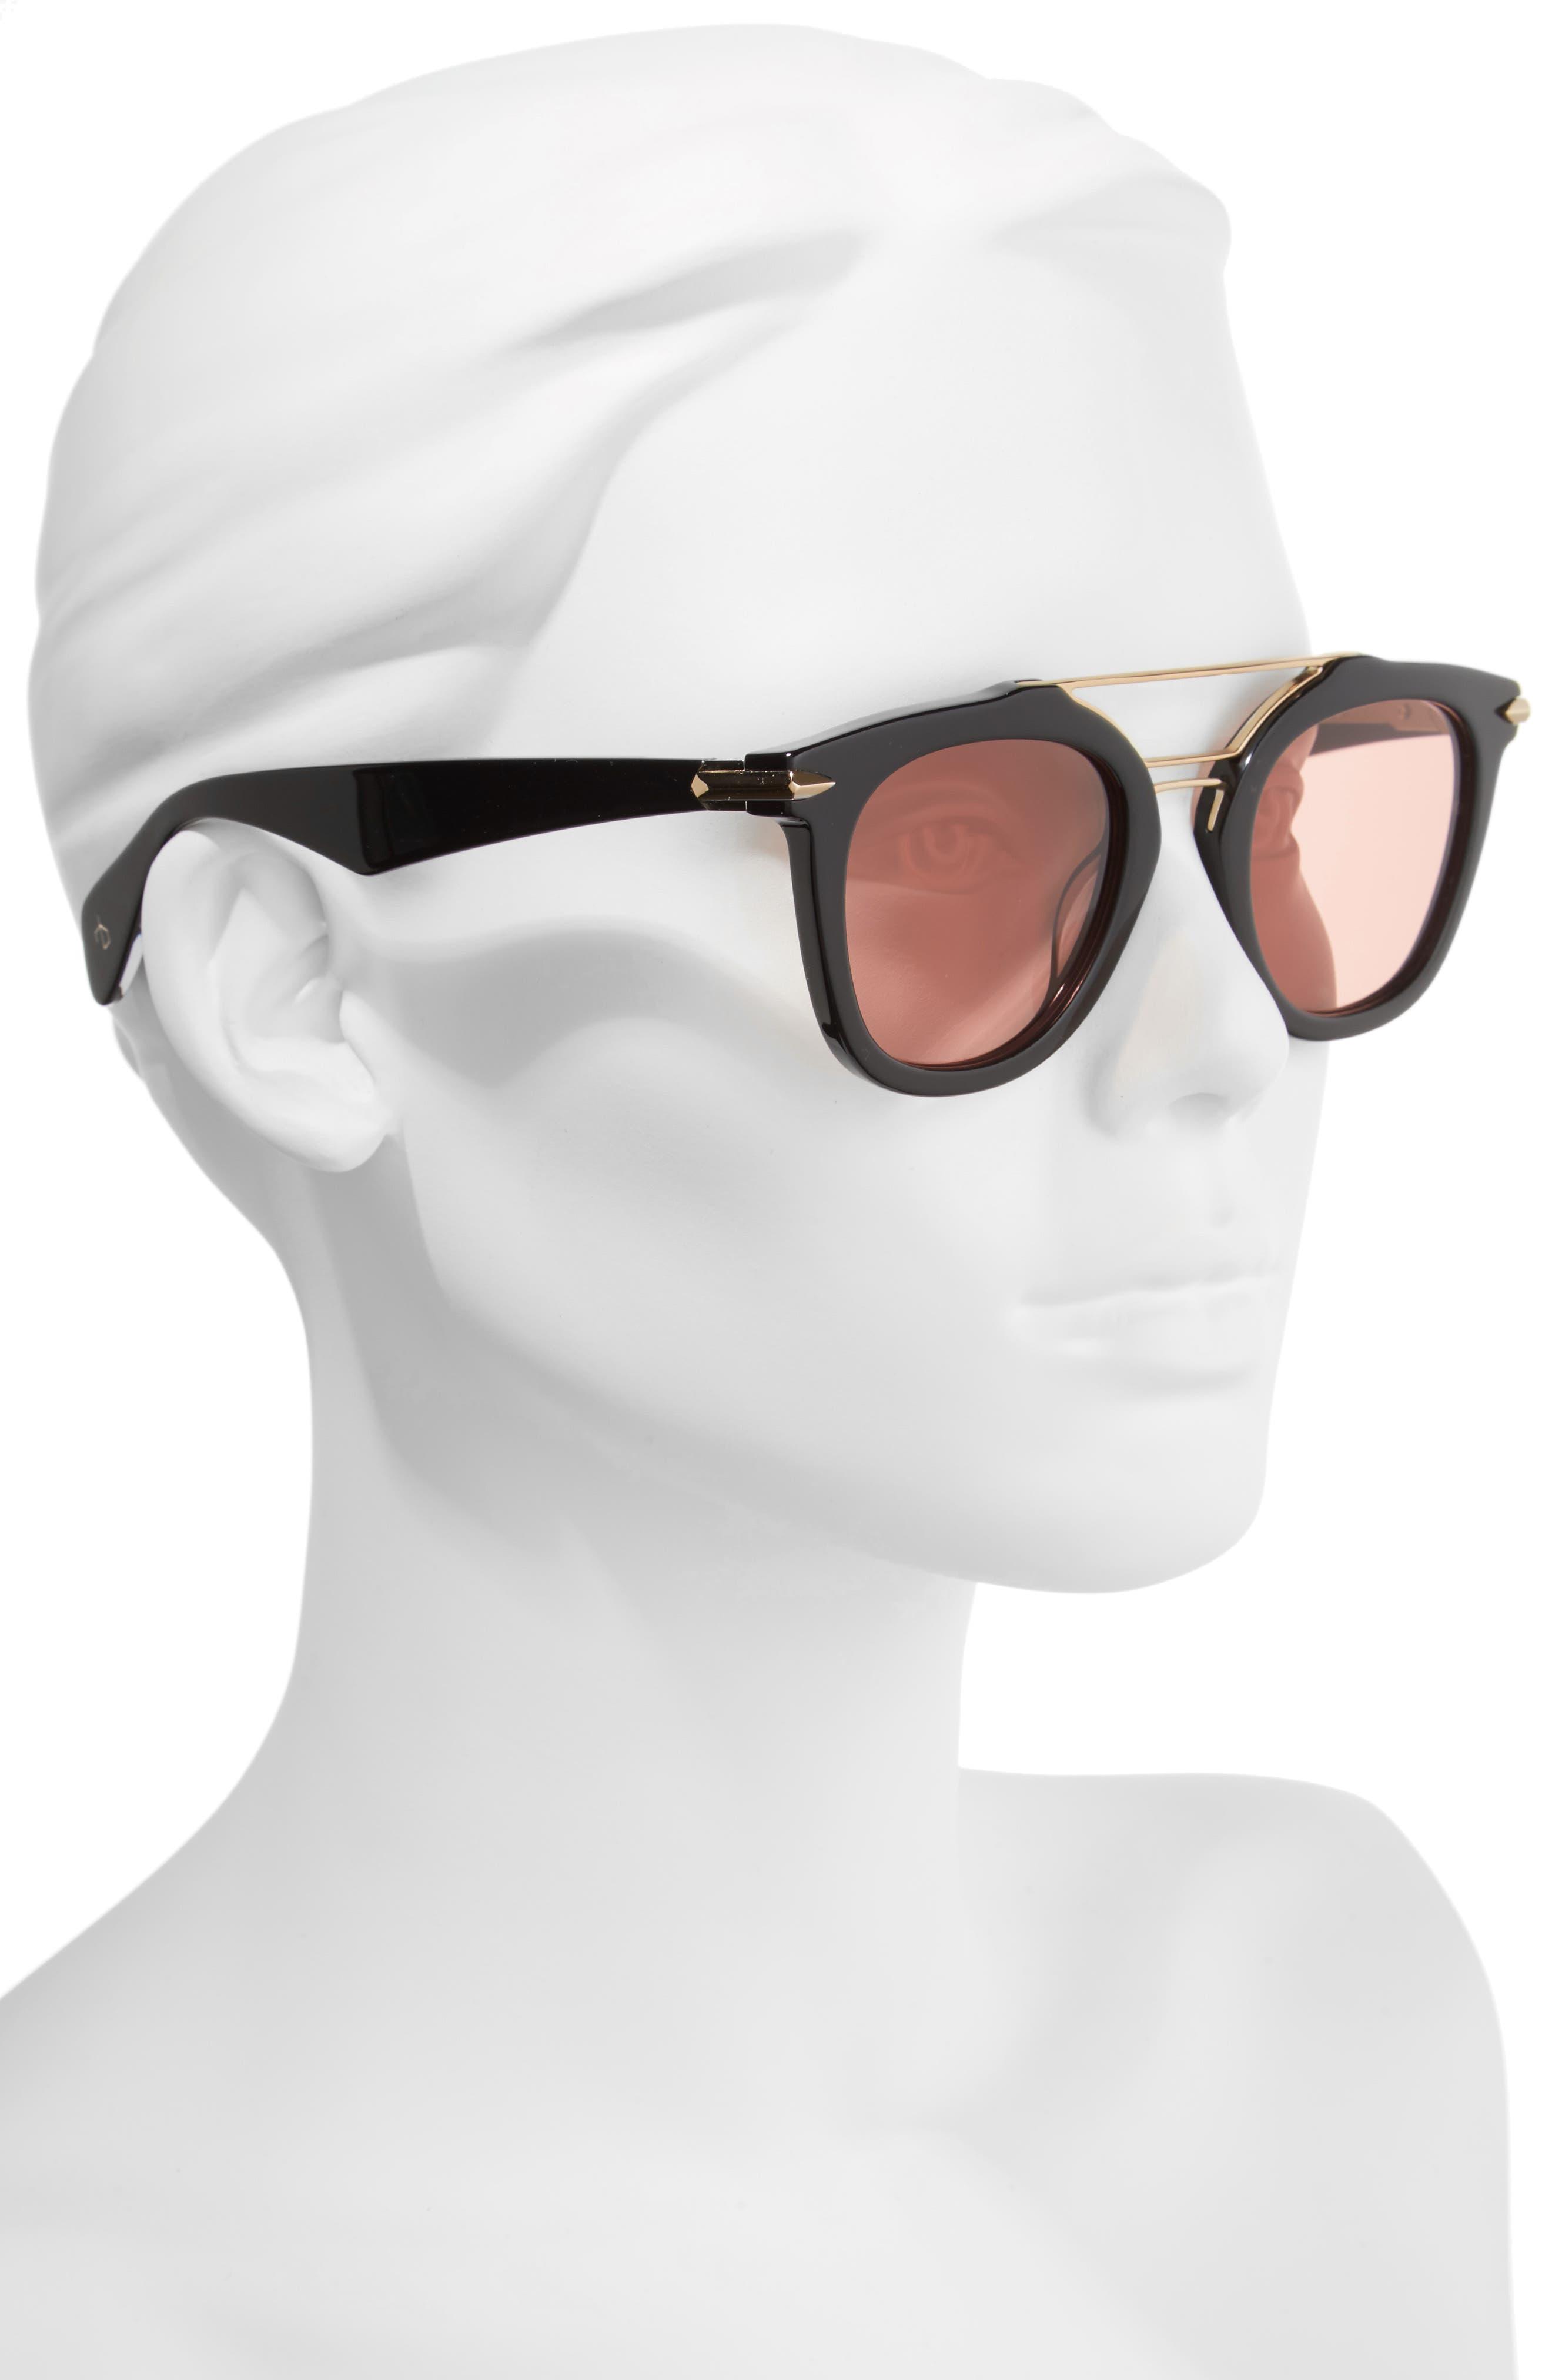 50mm Round Aviator Sunglasses,                             Alternate thumbnail 2, color,                             BLACK/ GOLD/ BRONZE